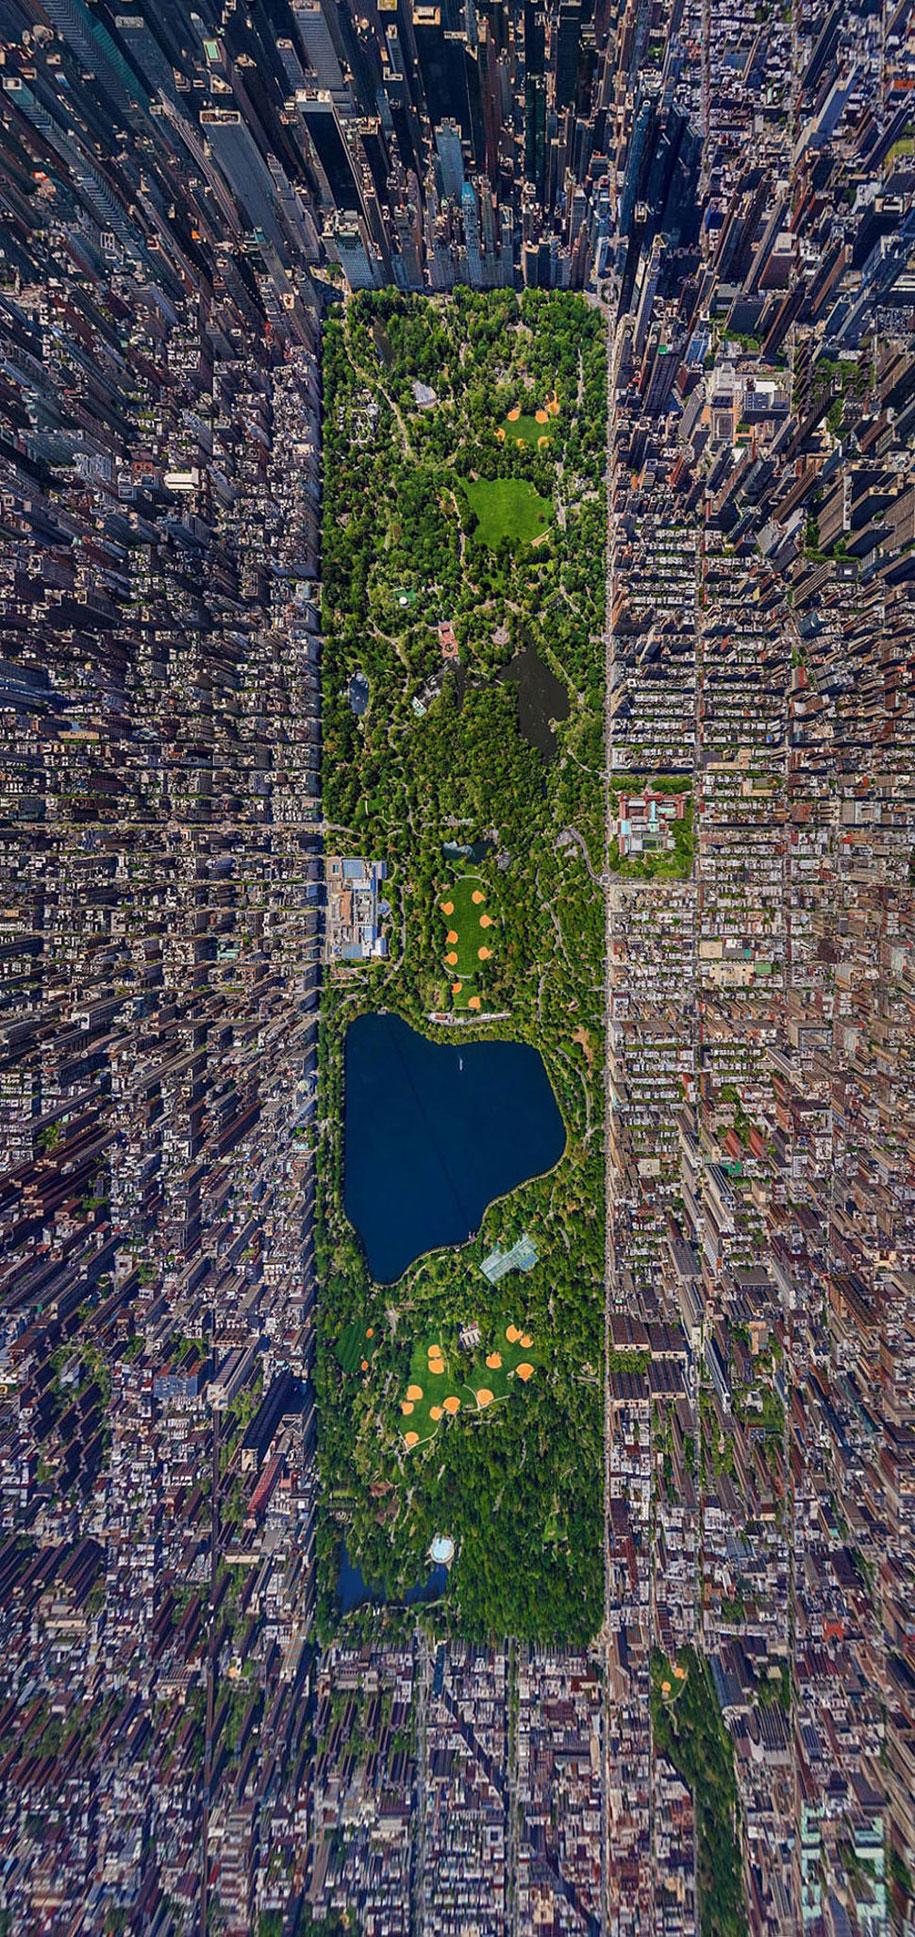 aerial-photography-birds-eye-view-panorama-airpano-27